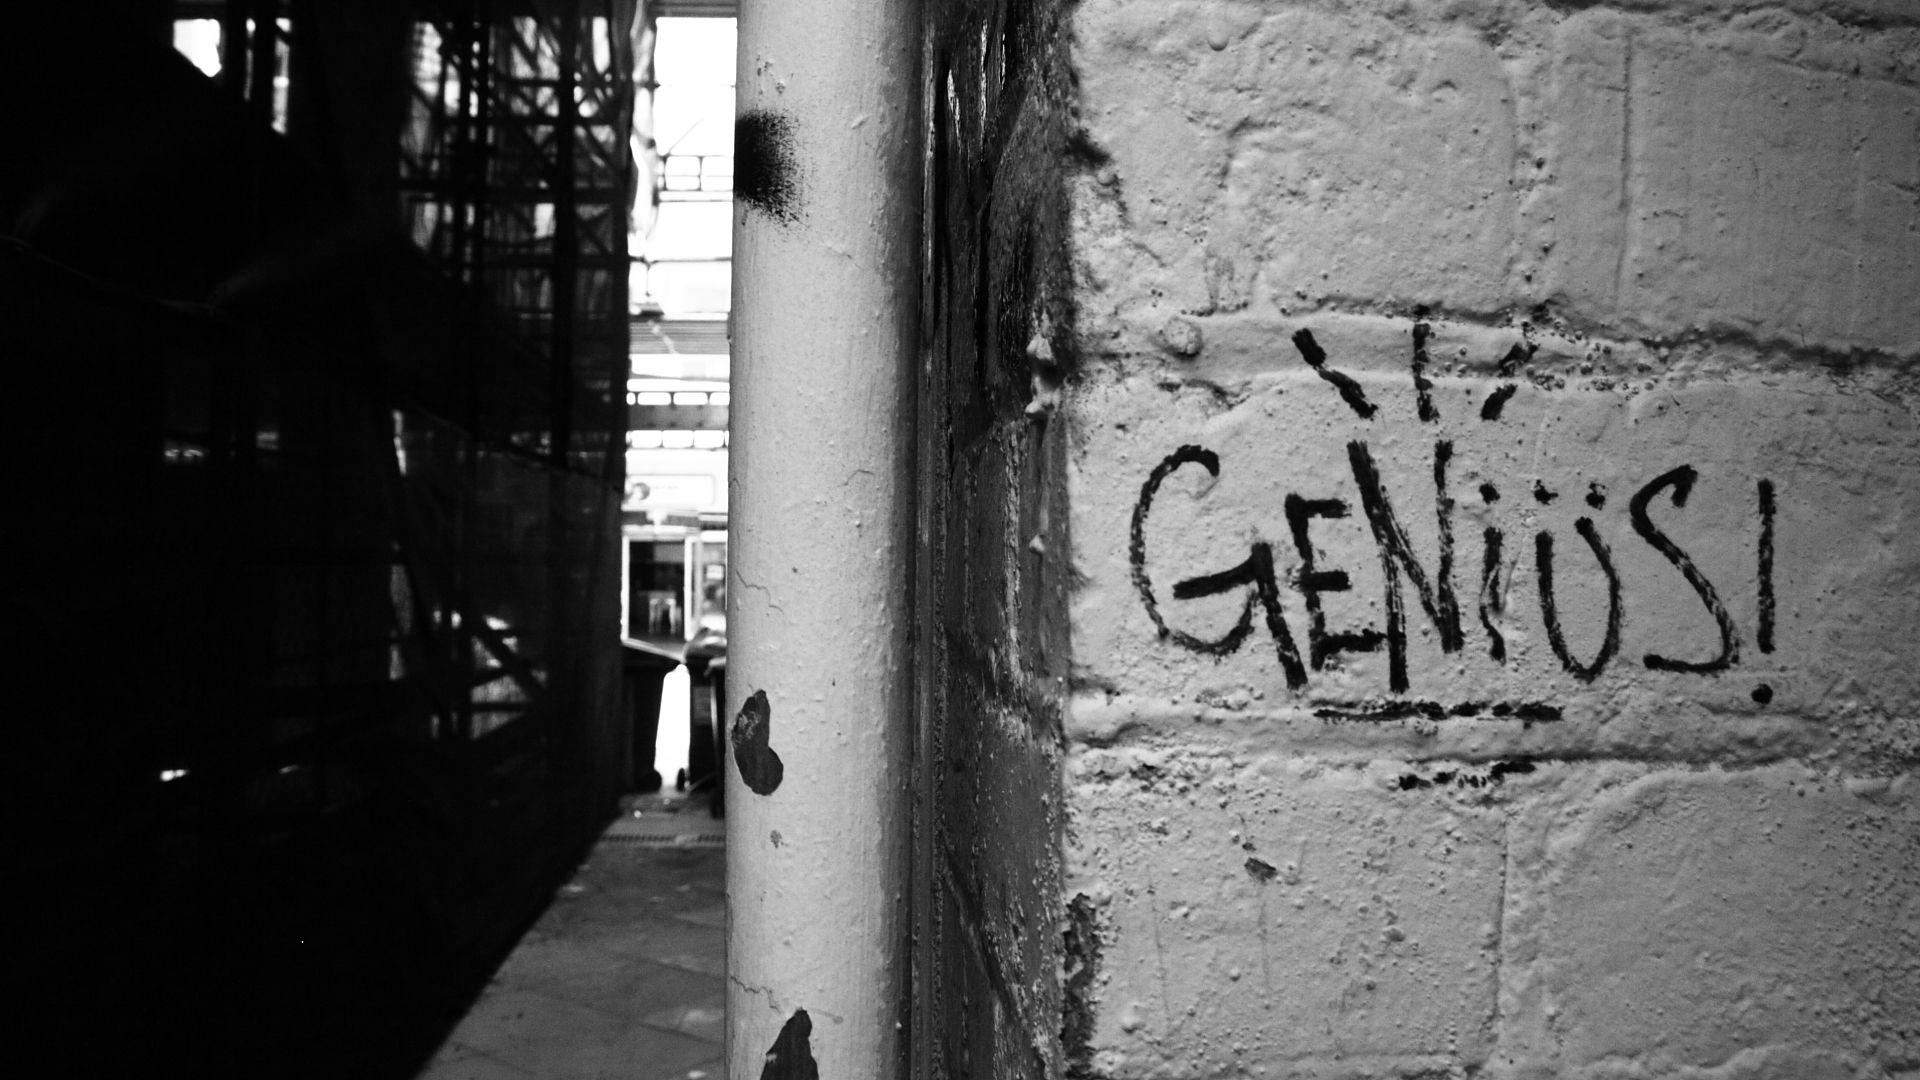 graffiti art pictures